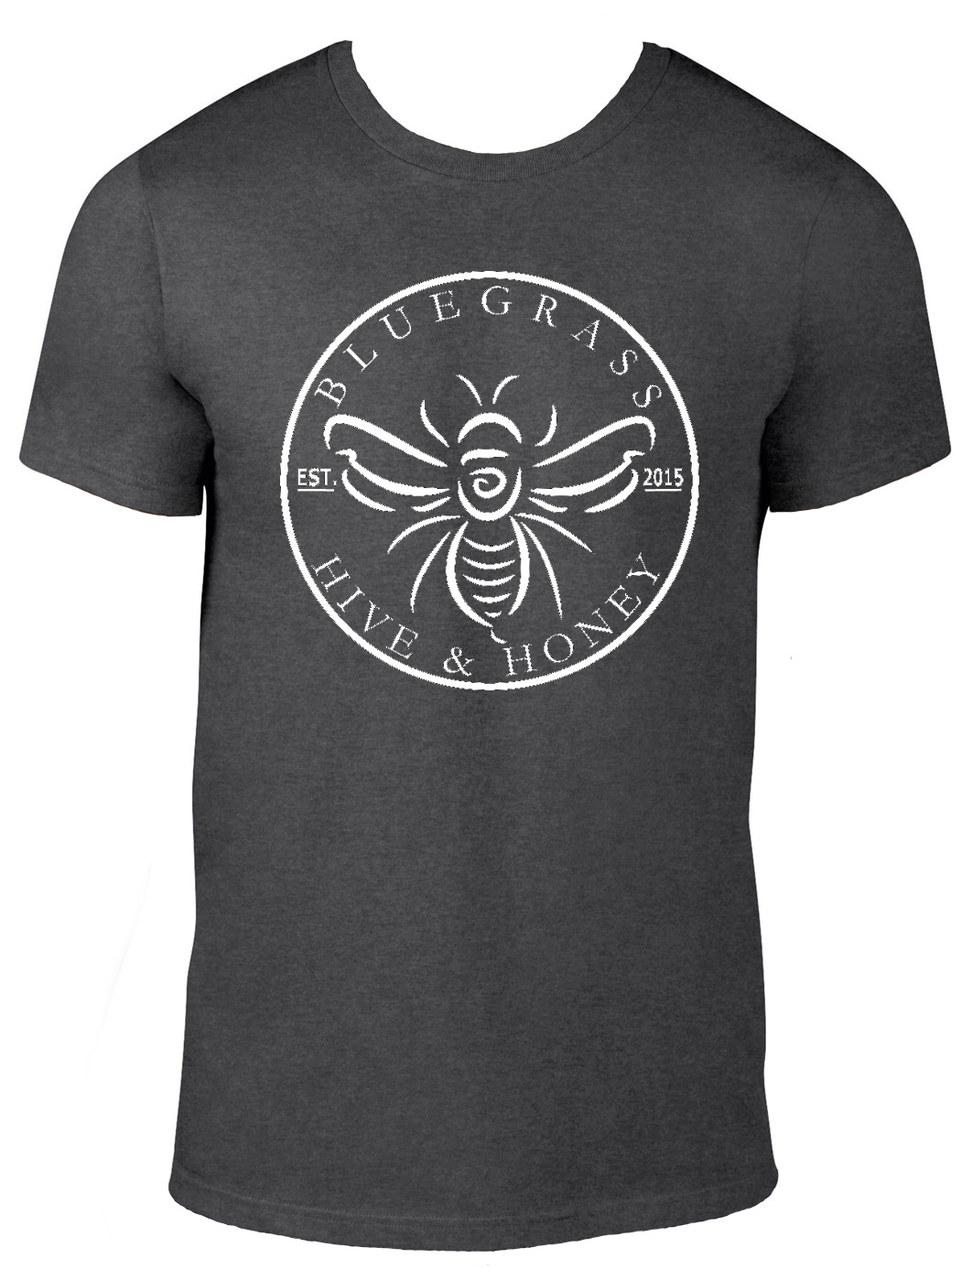 Bluegrass Hive and Honey Men's T-Shirt